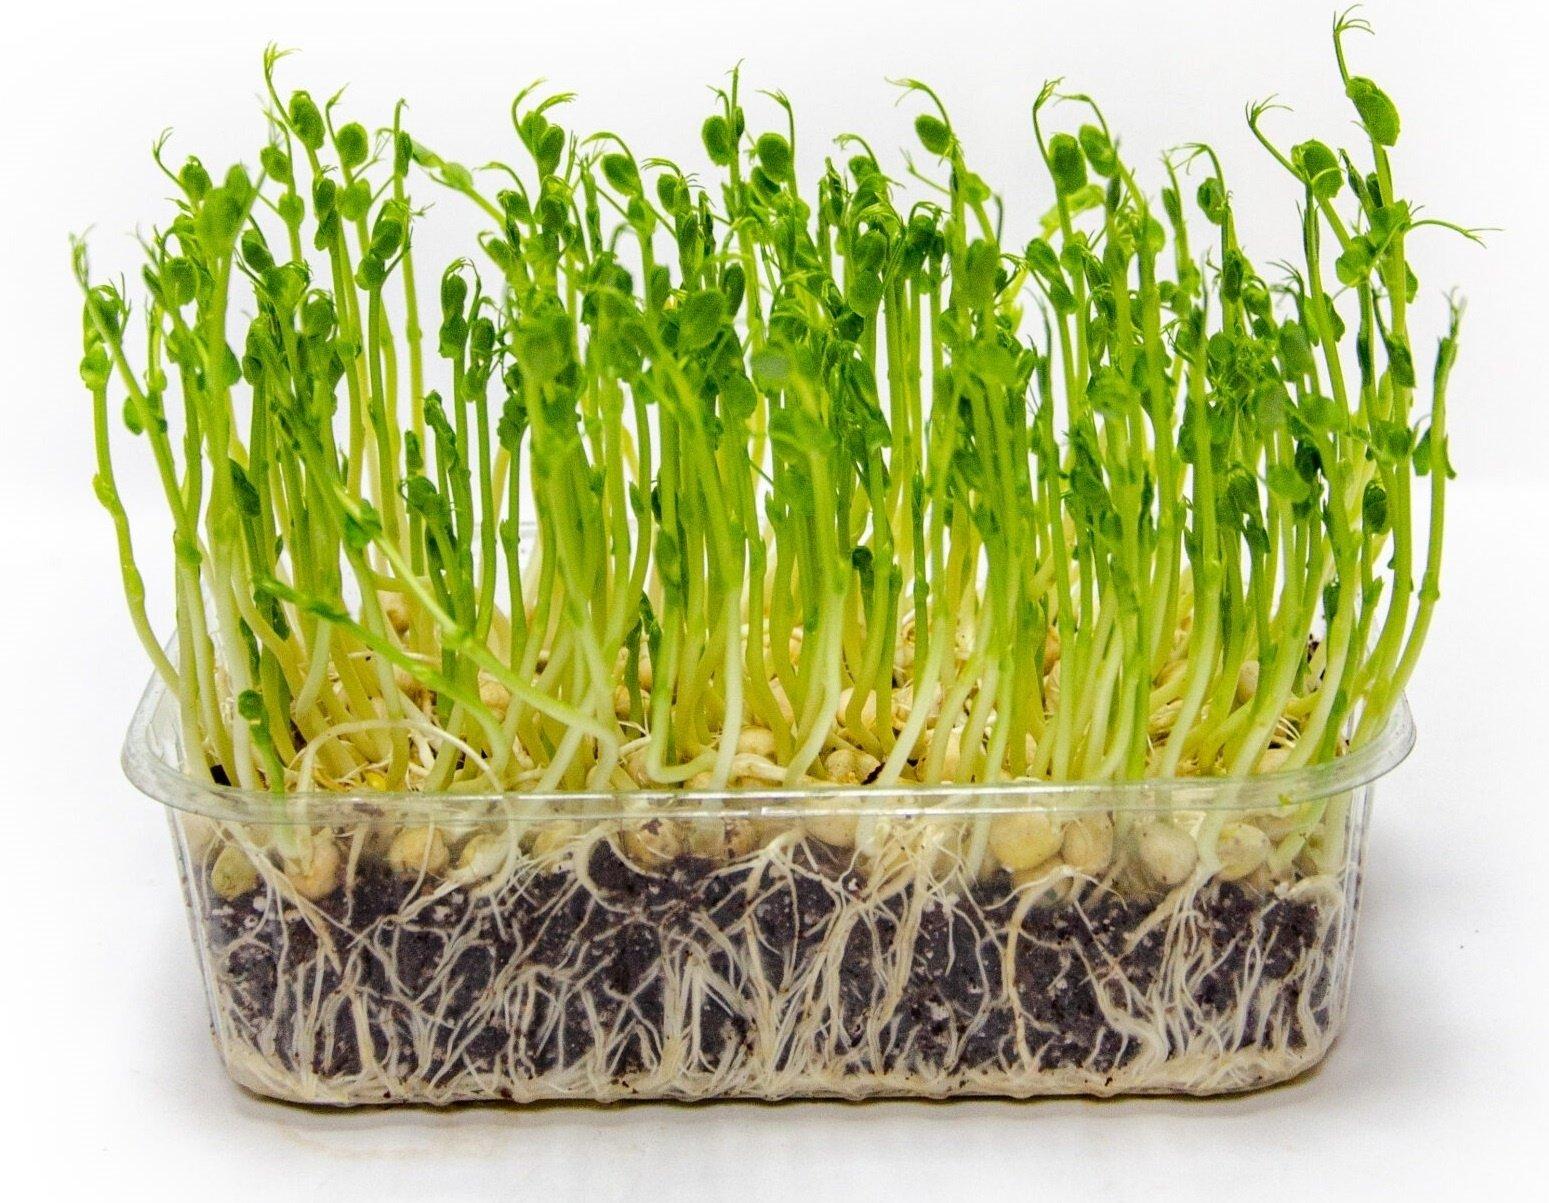 Преимущества и особенности свежей зелени